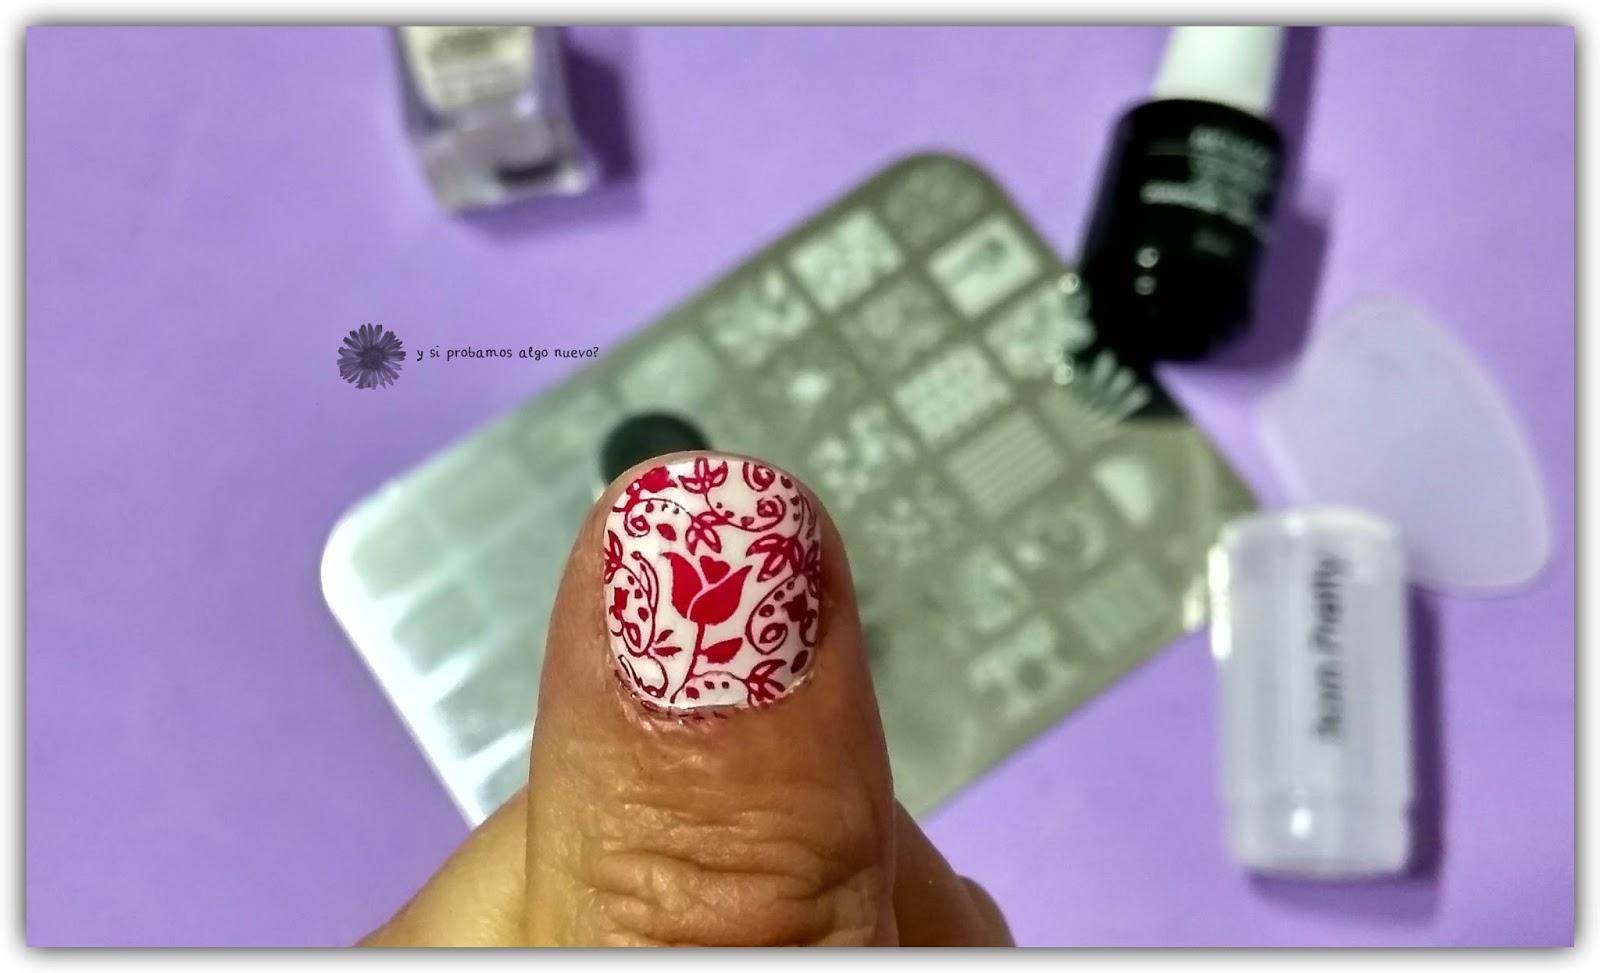 Esmalte colour & care de Essence y manicura